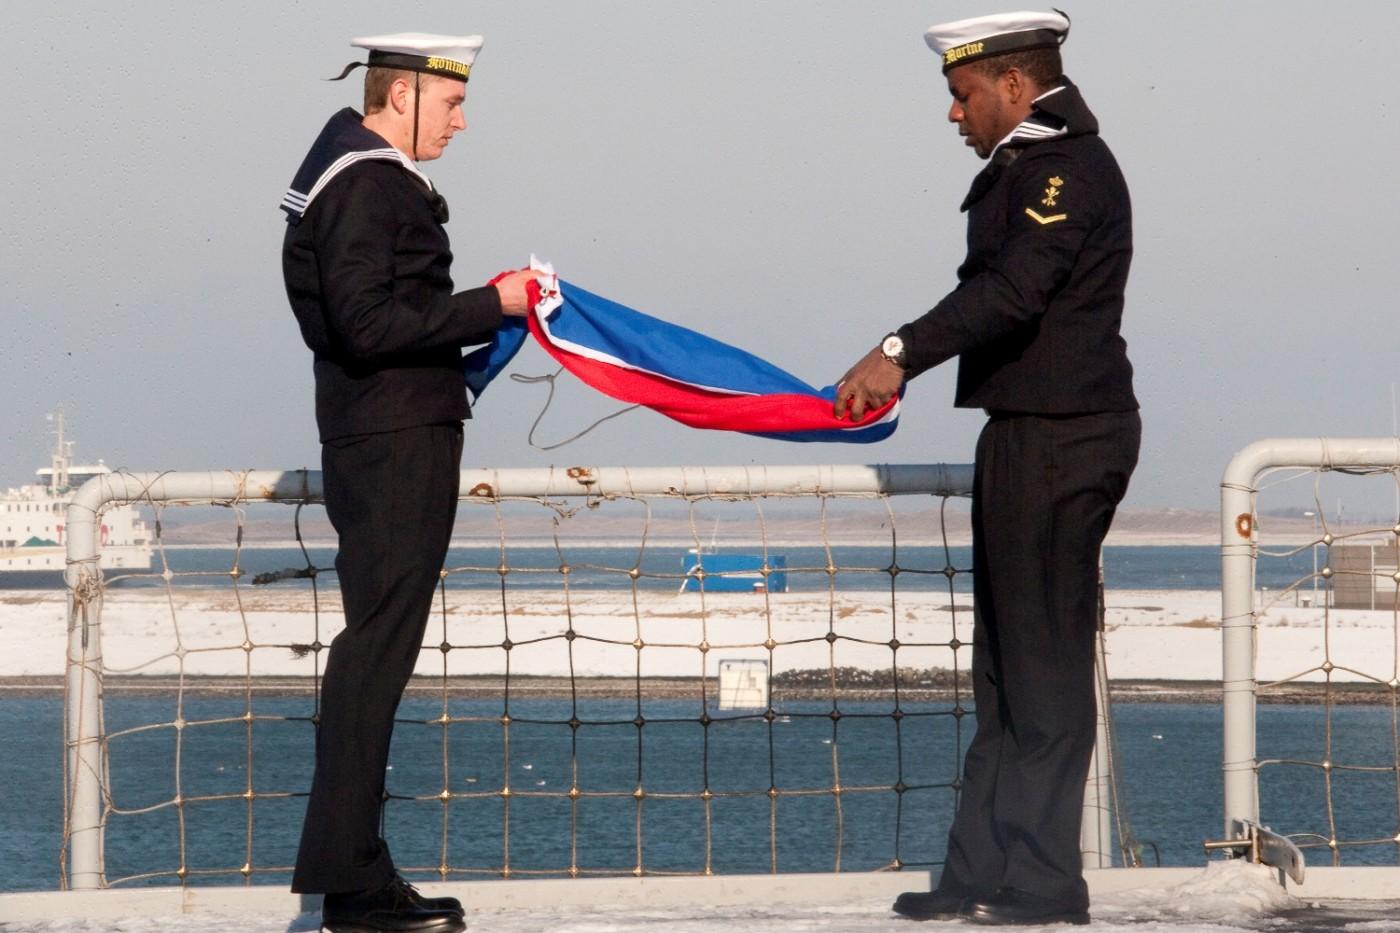 Ouderdomsrecord Nederlandse marinevloot bijna bereikt